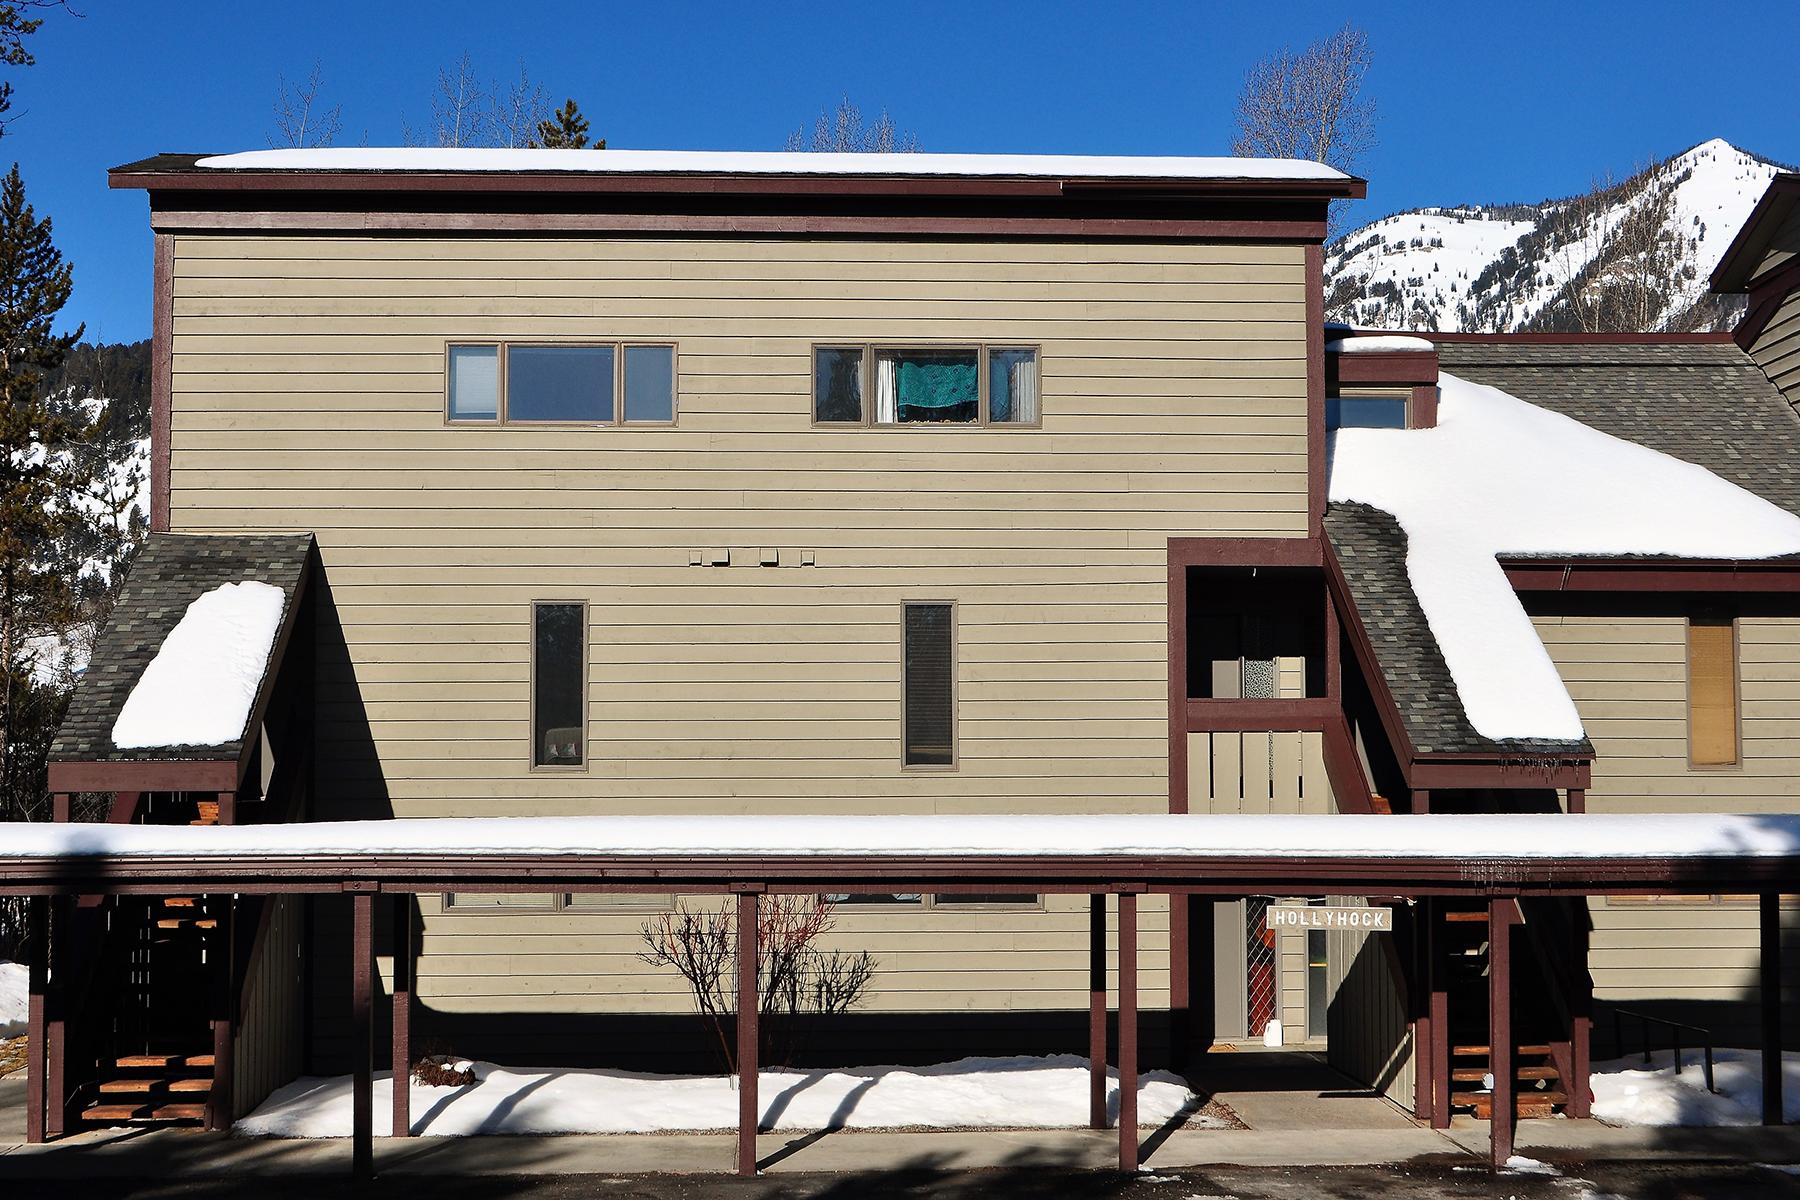 共管物業 為 出售 在 One Bedroom Aspens Hollyhock Condominium 4013 W LAKE CREEK DR 2012, Wilson, 懷俄明州, 83014 Jackson Hole, 美國